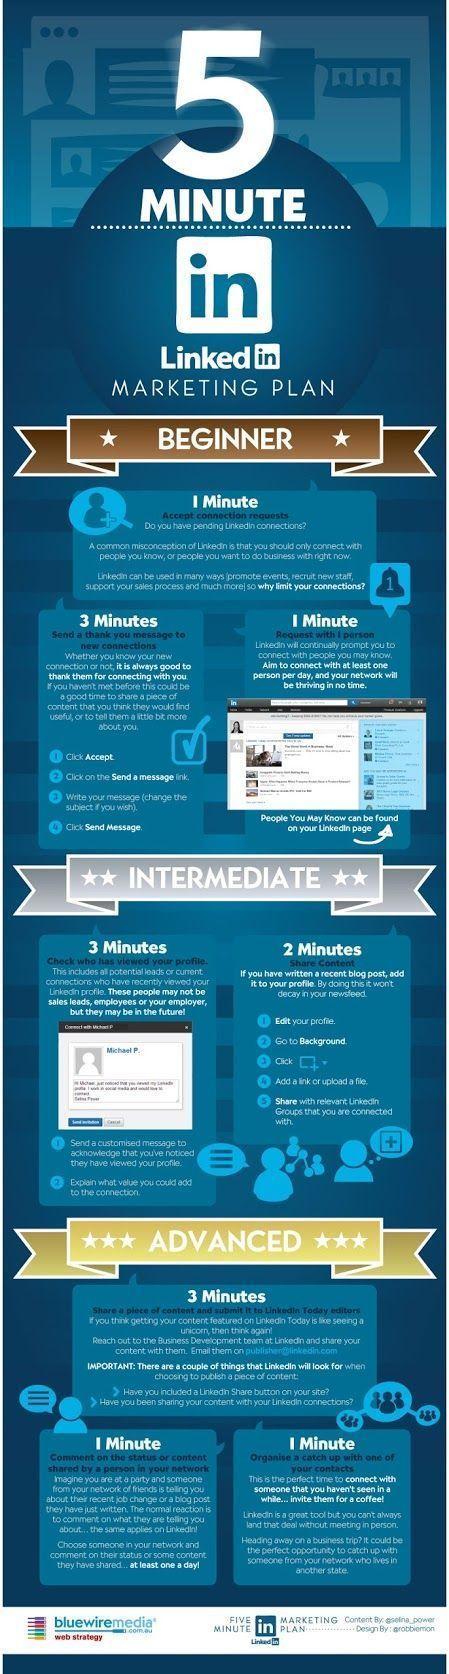 5 Minutes LinkedIn Marketing Plan #MarketingConcept